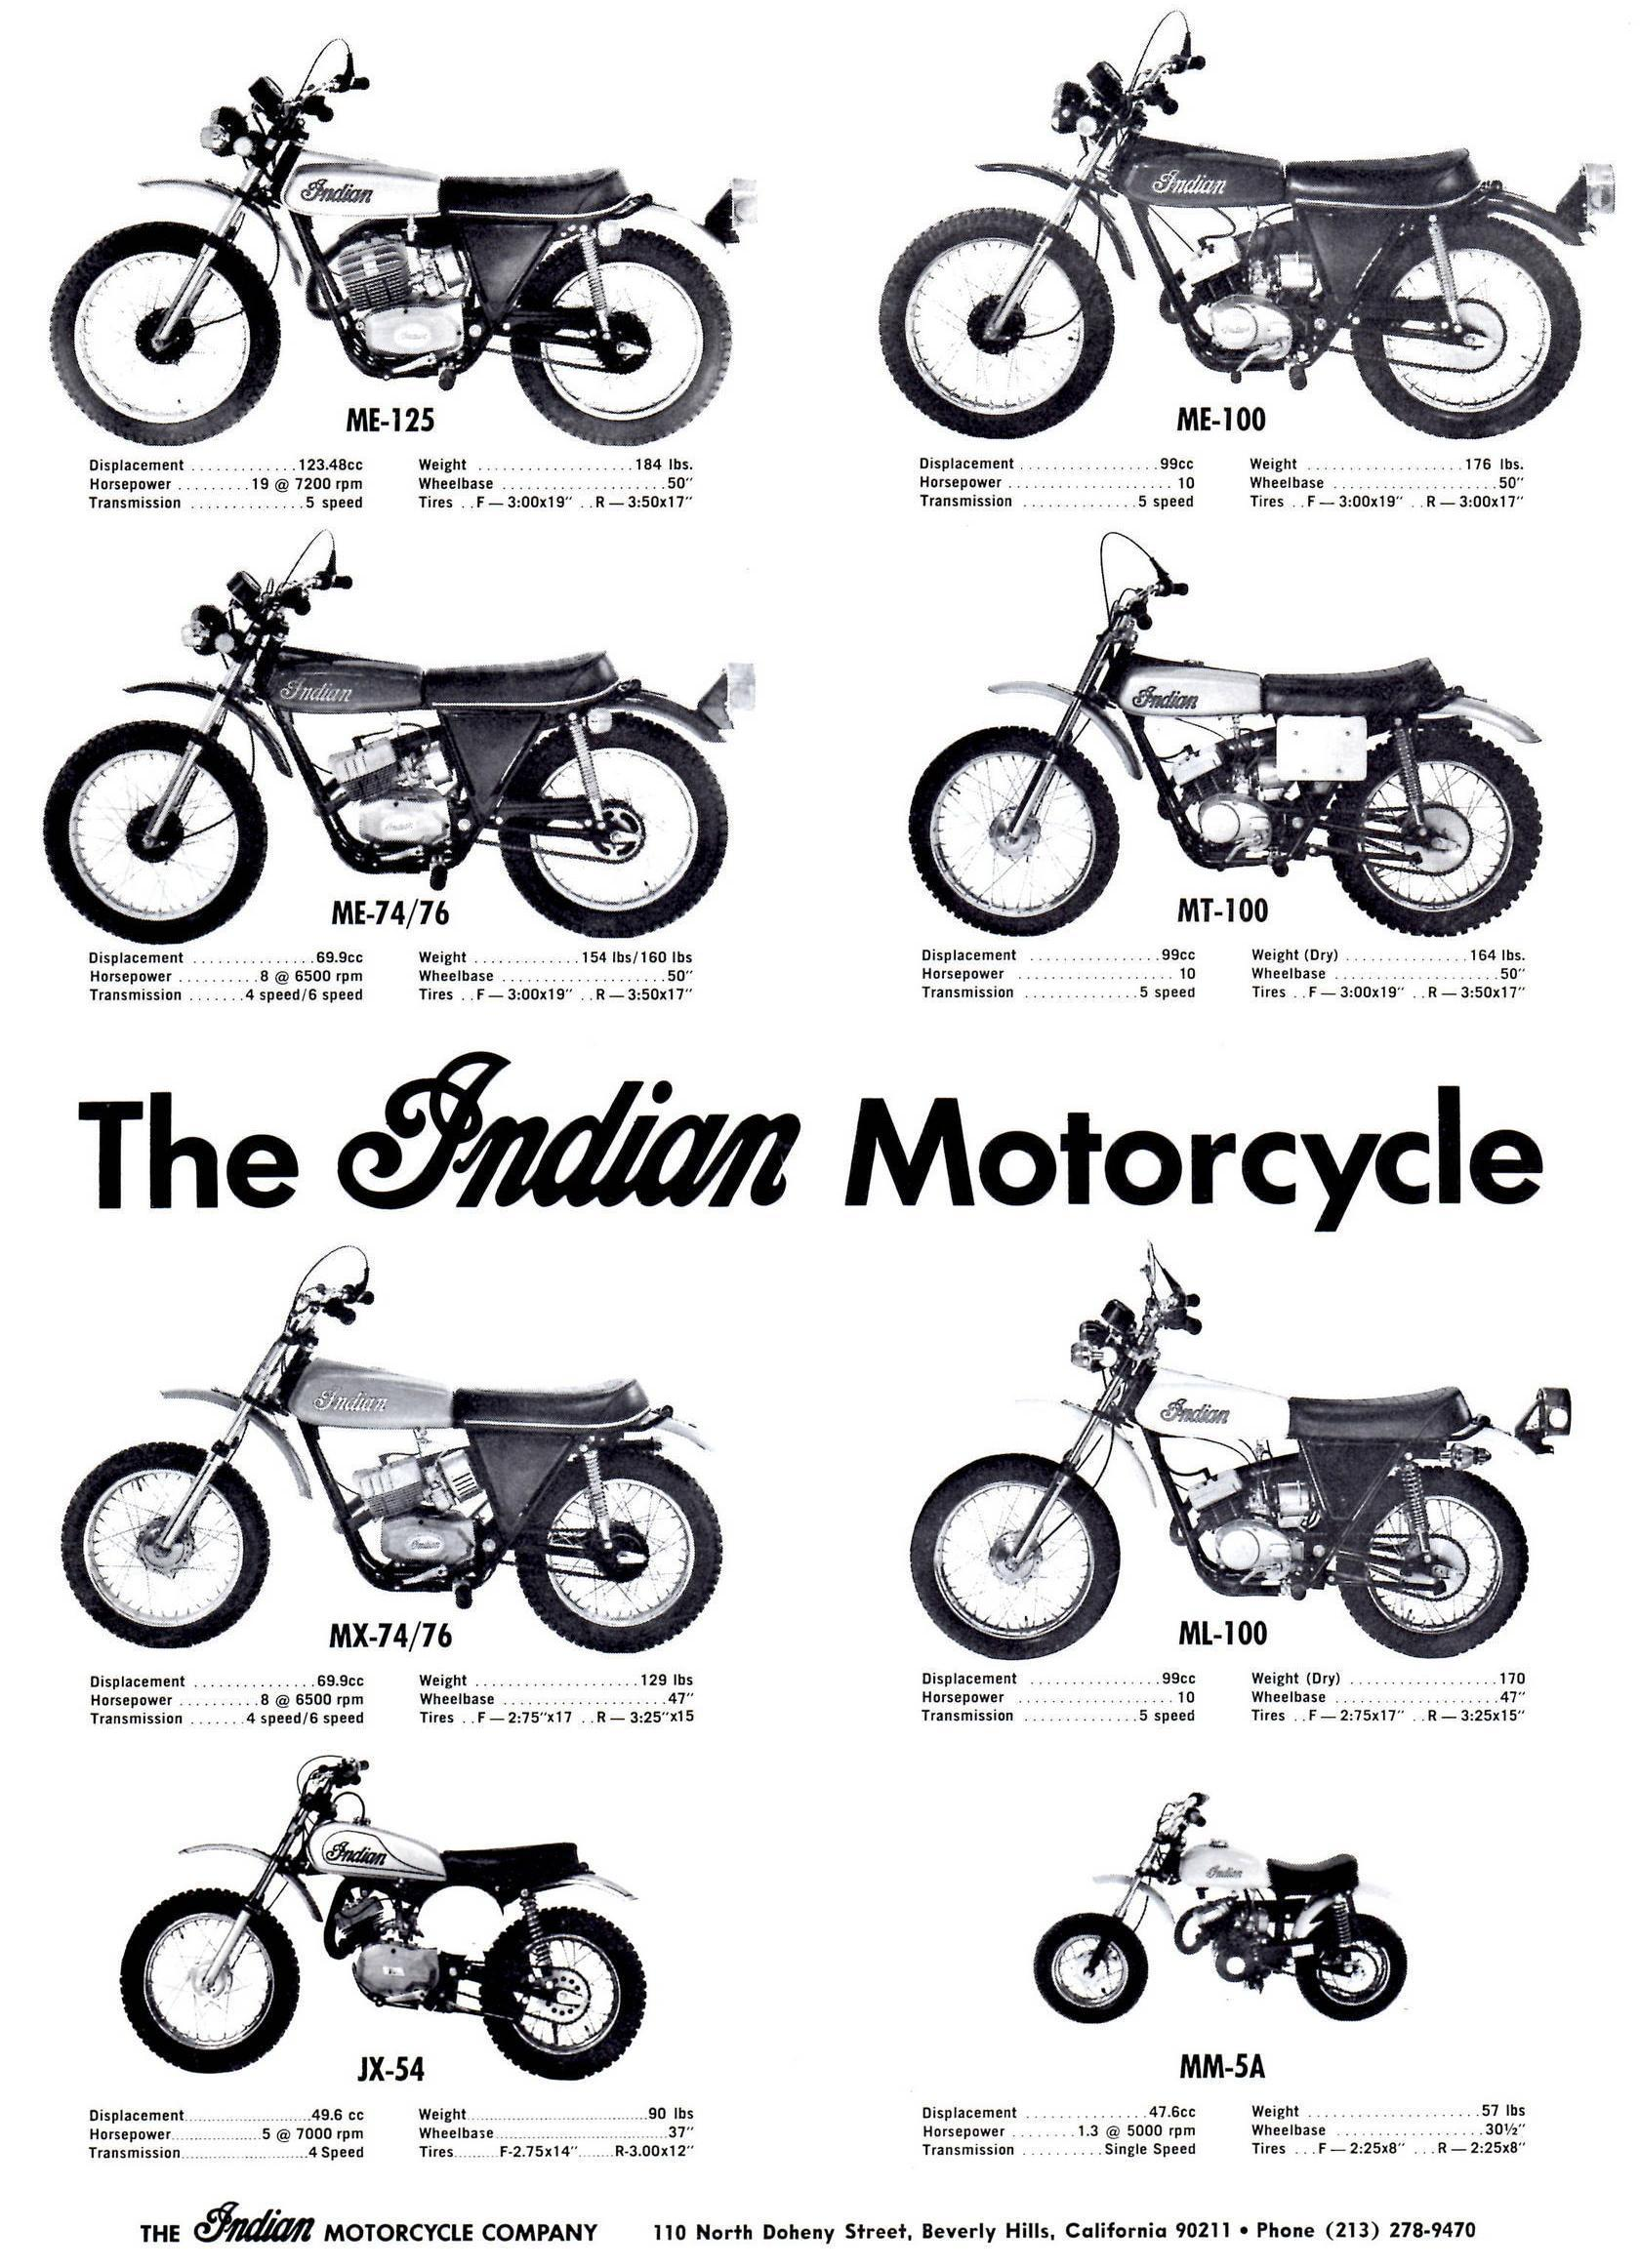 2001 Harley Sportster Wiring Diagram Com